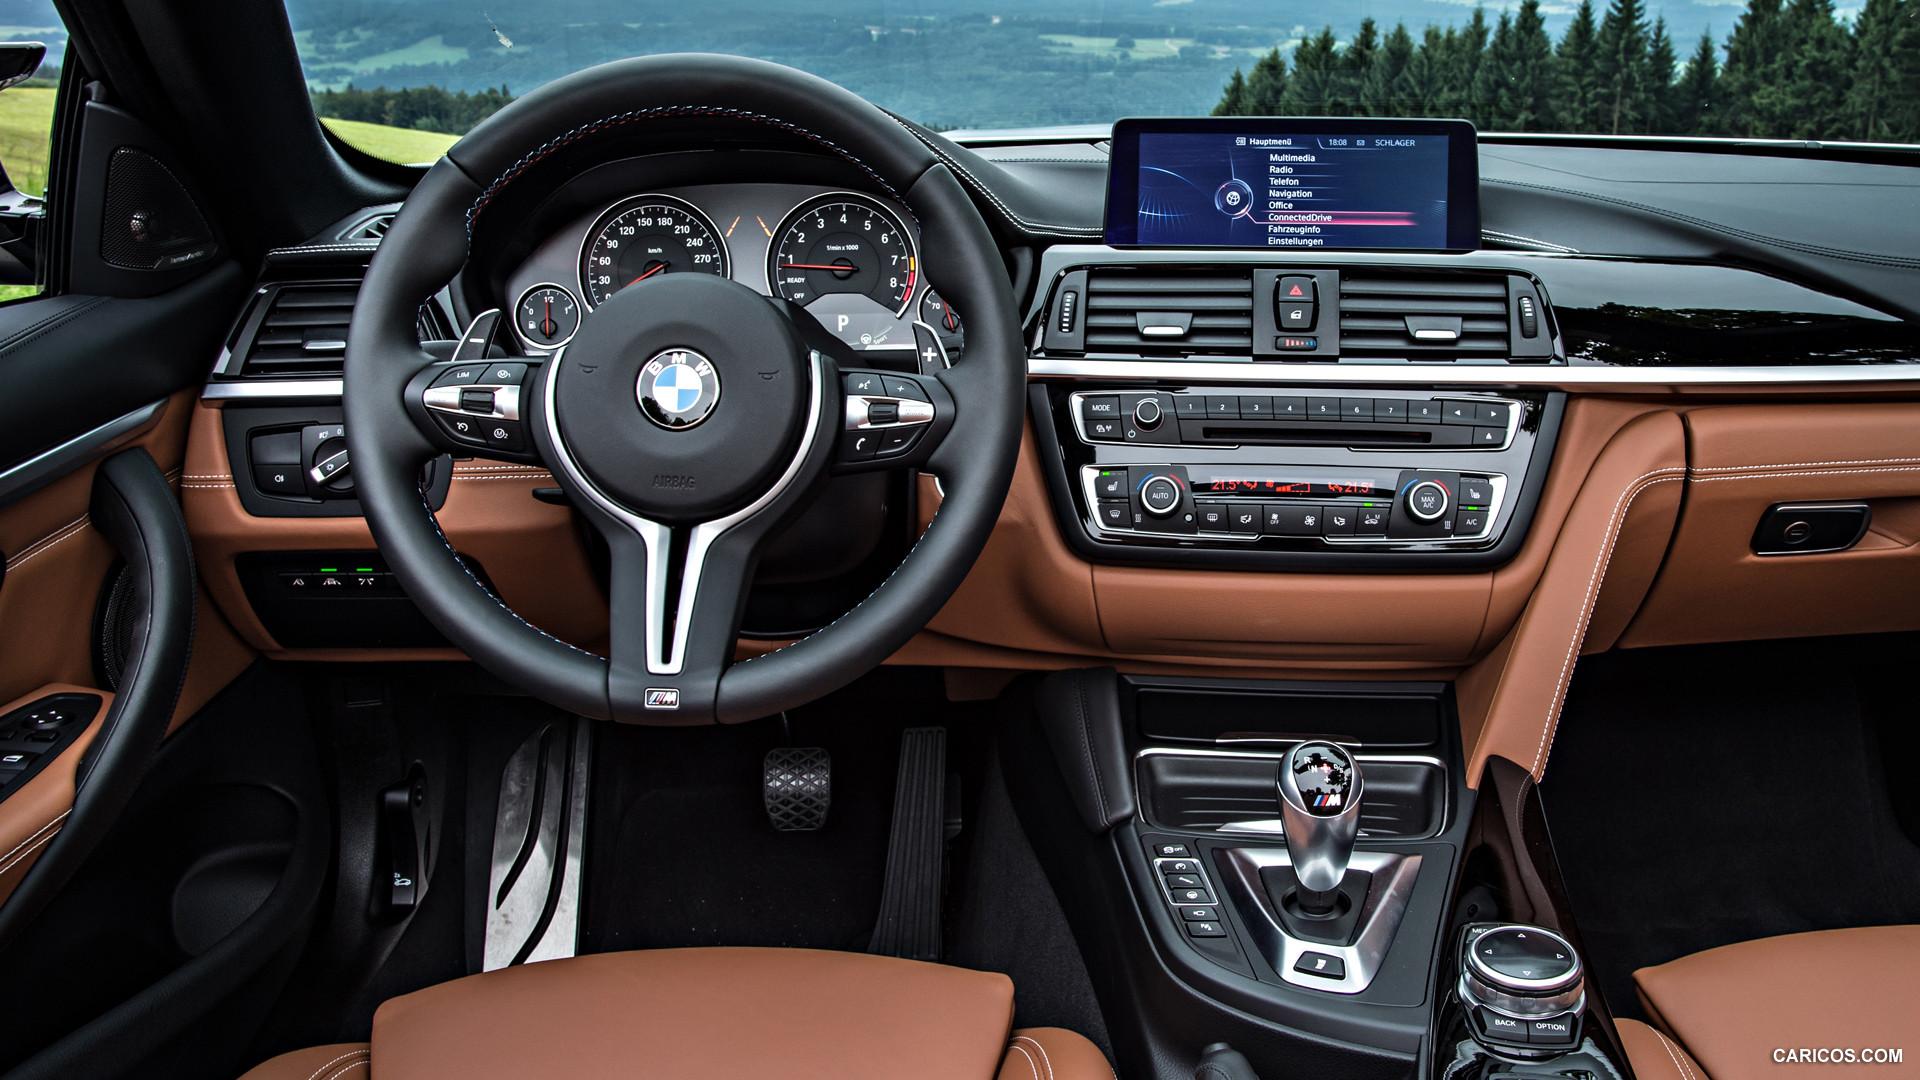 2015 BMW M4 Convertible - Interior Wallpaper